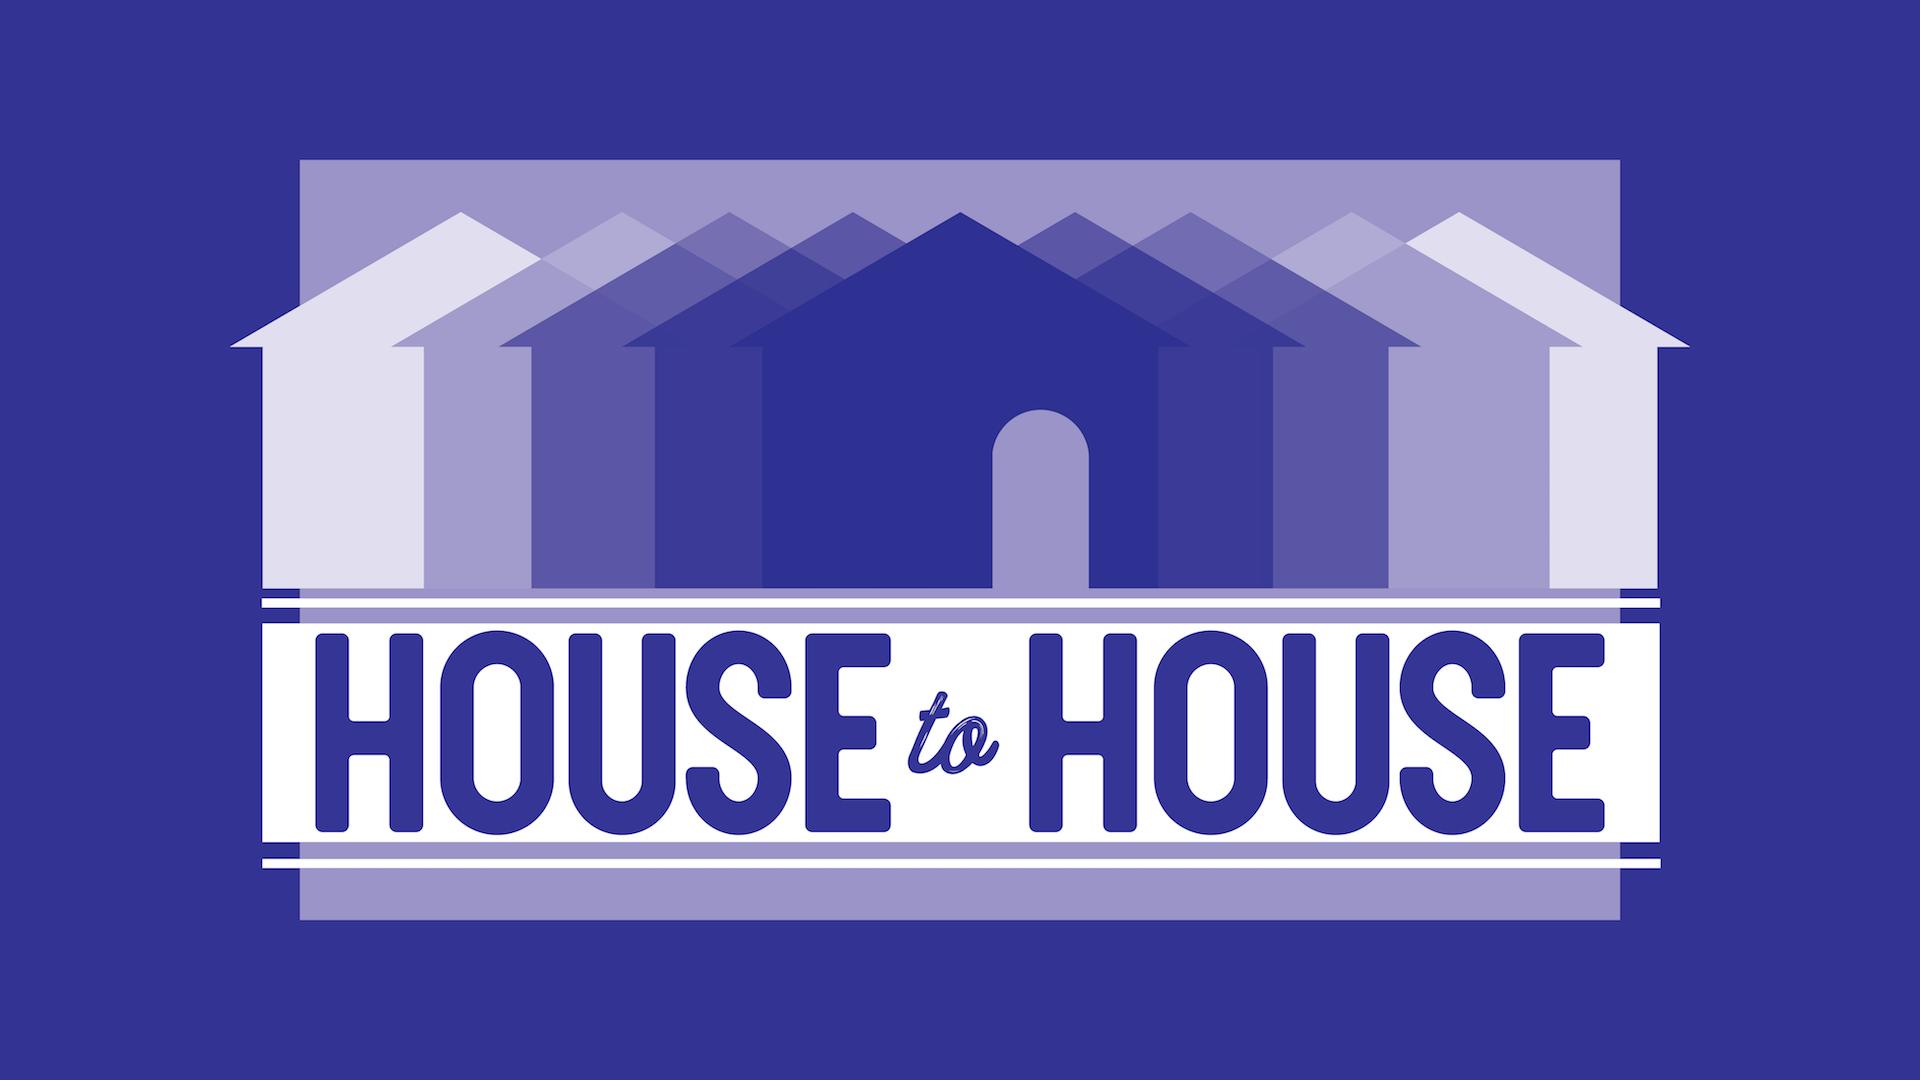 house to house FINAL.jpg